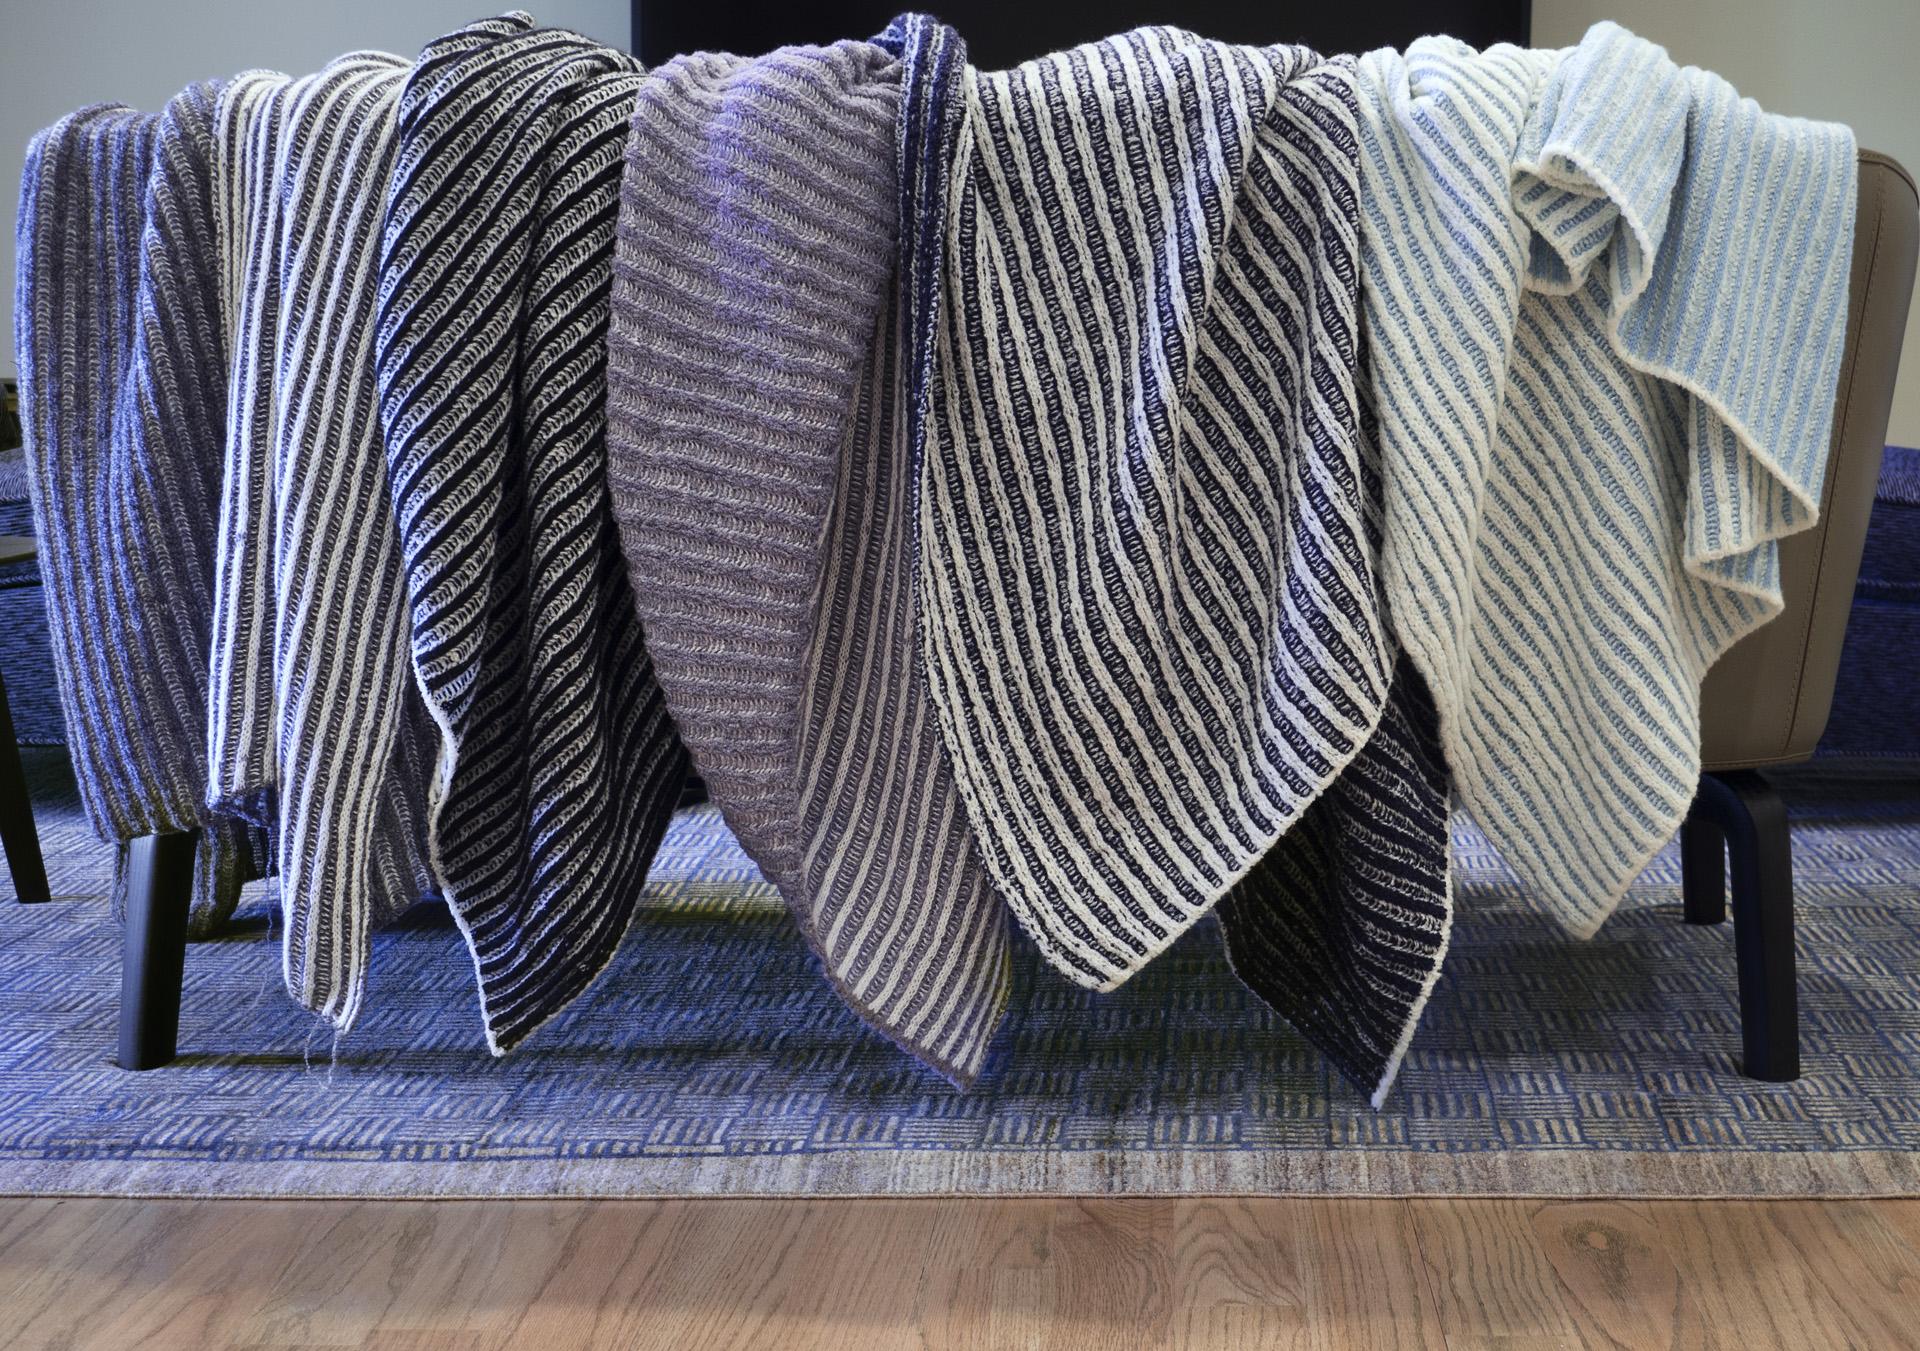 Colors: gray/white, brown/white, black/white, lavender/white, navy/white, robin's egg blue/white